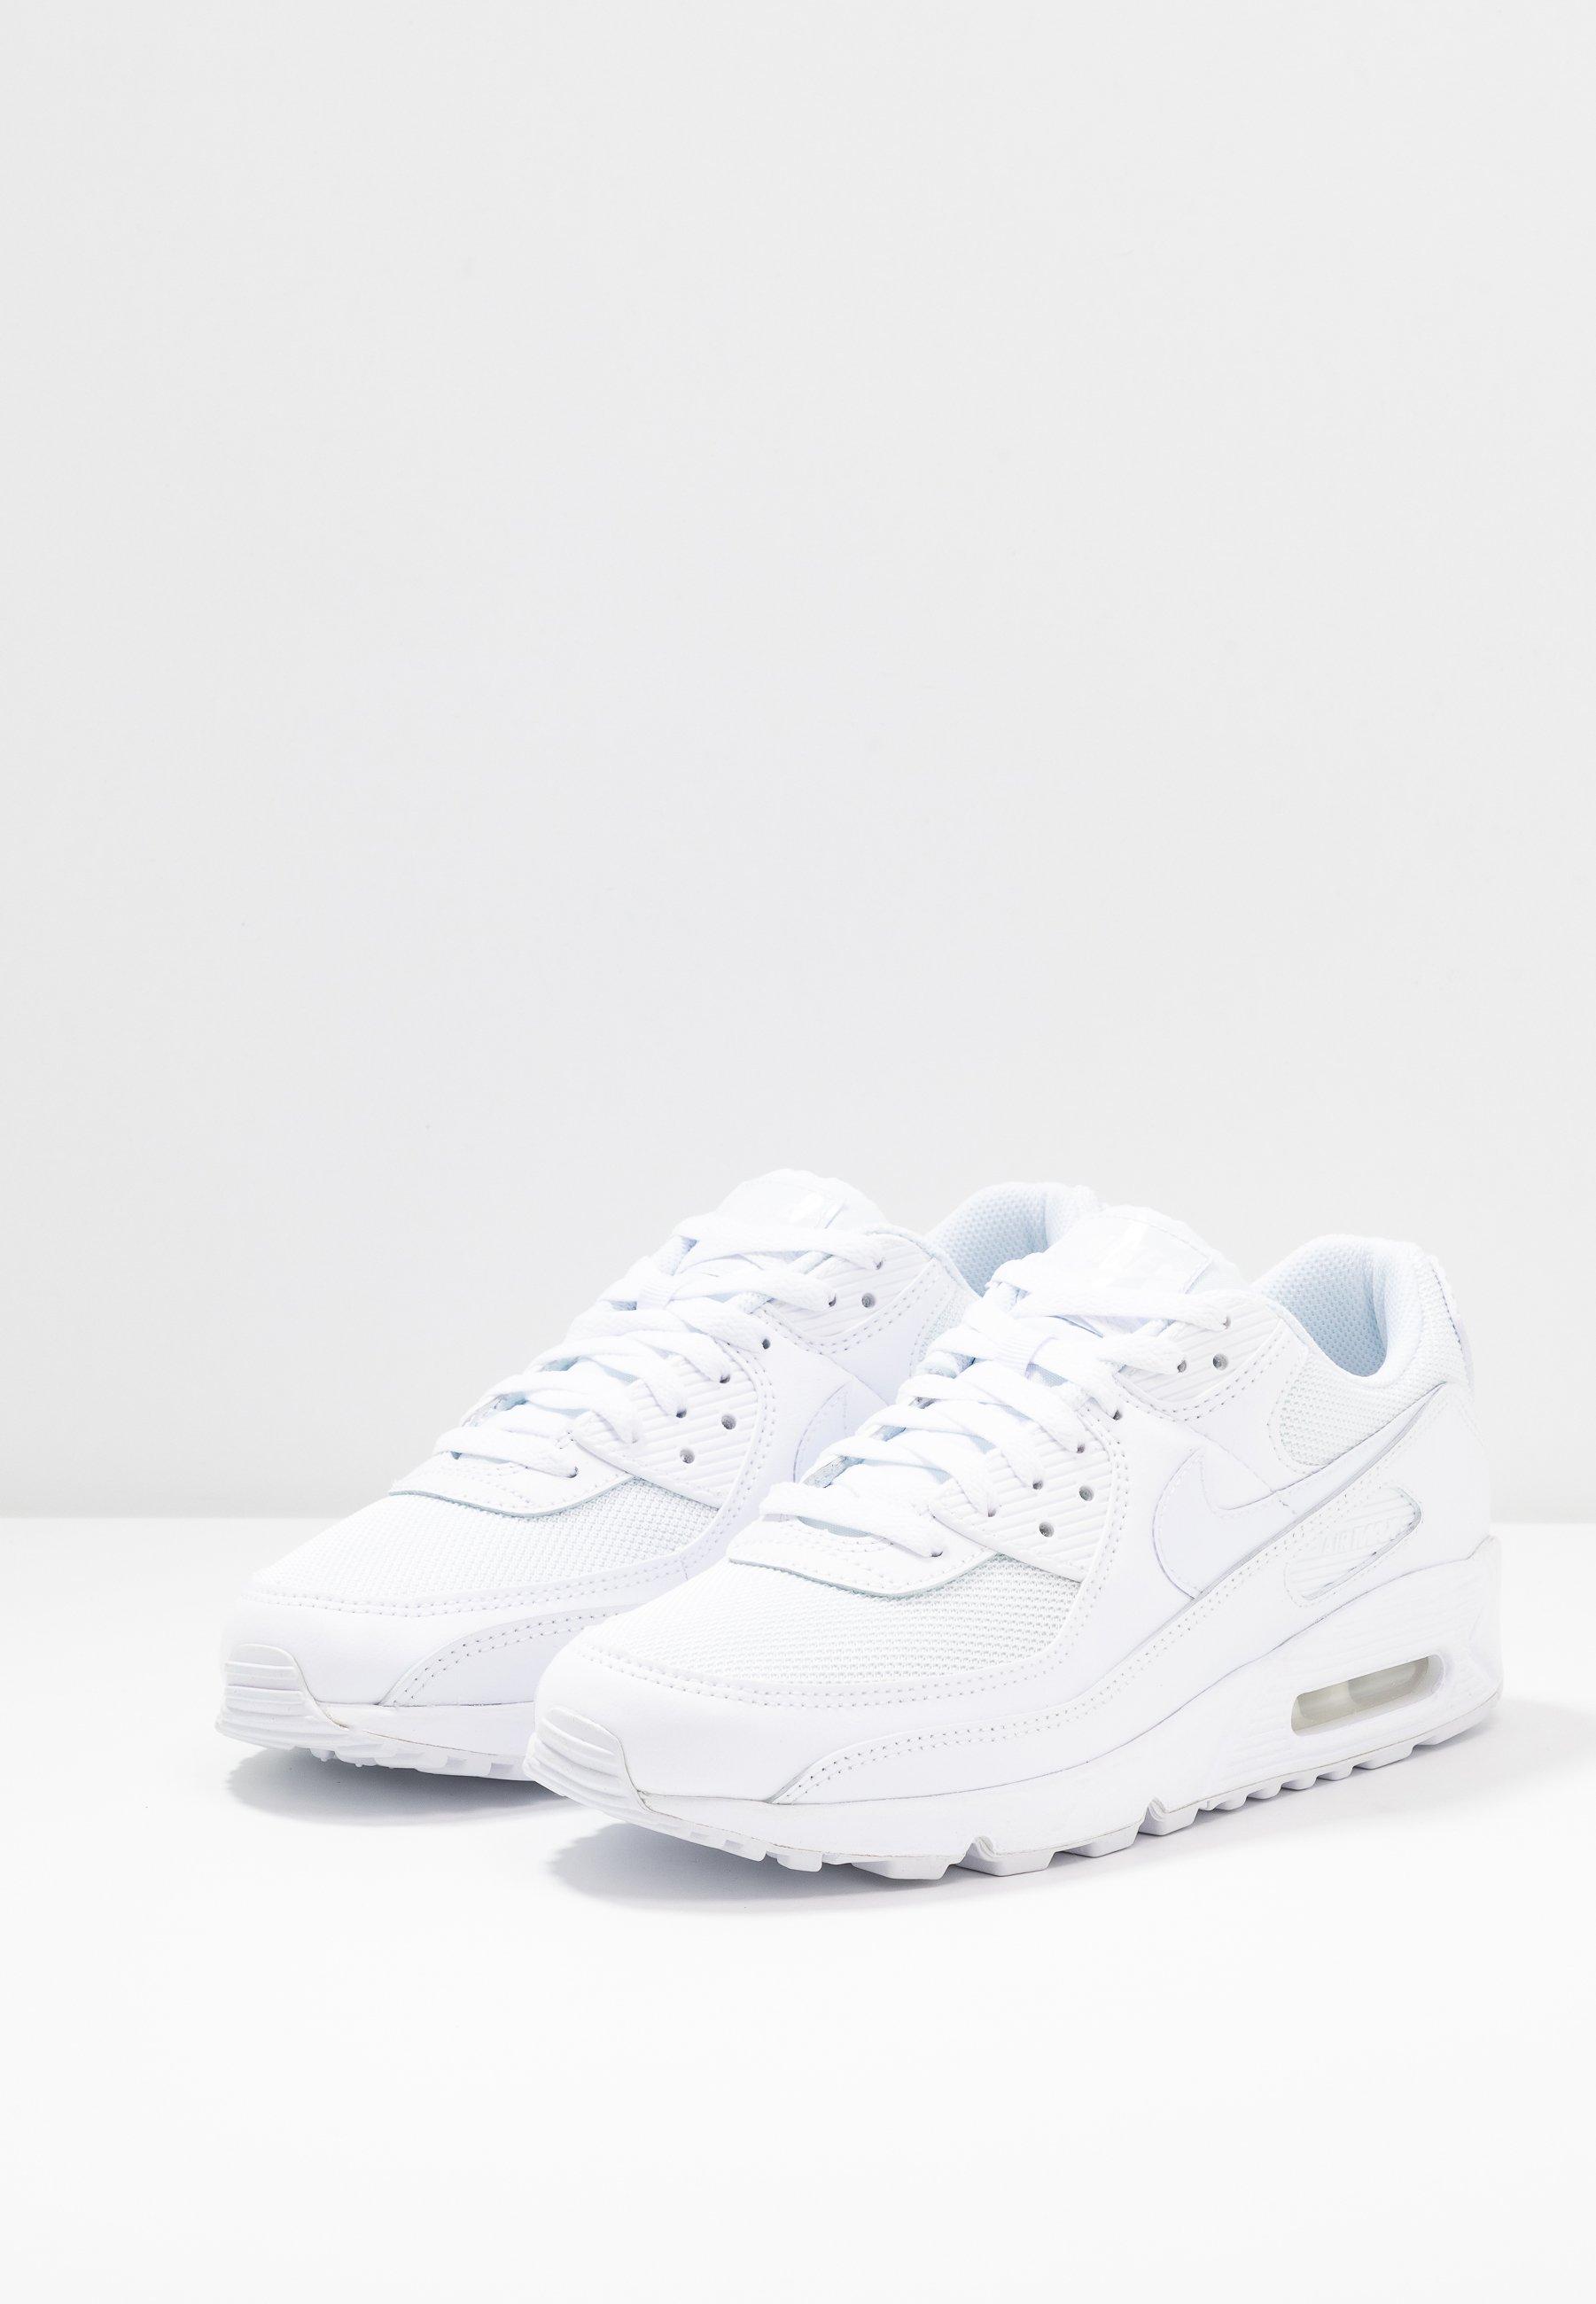 Nike Sportswear Air Max 90 - Sneakers Laag White 26bC5AF